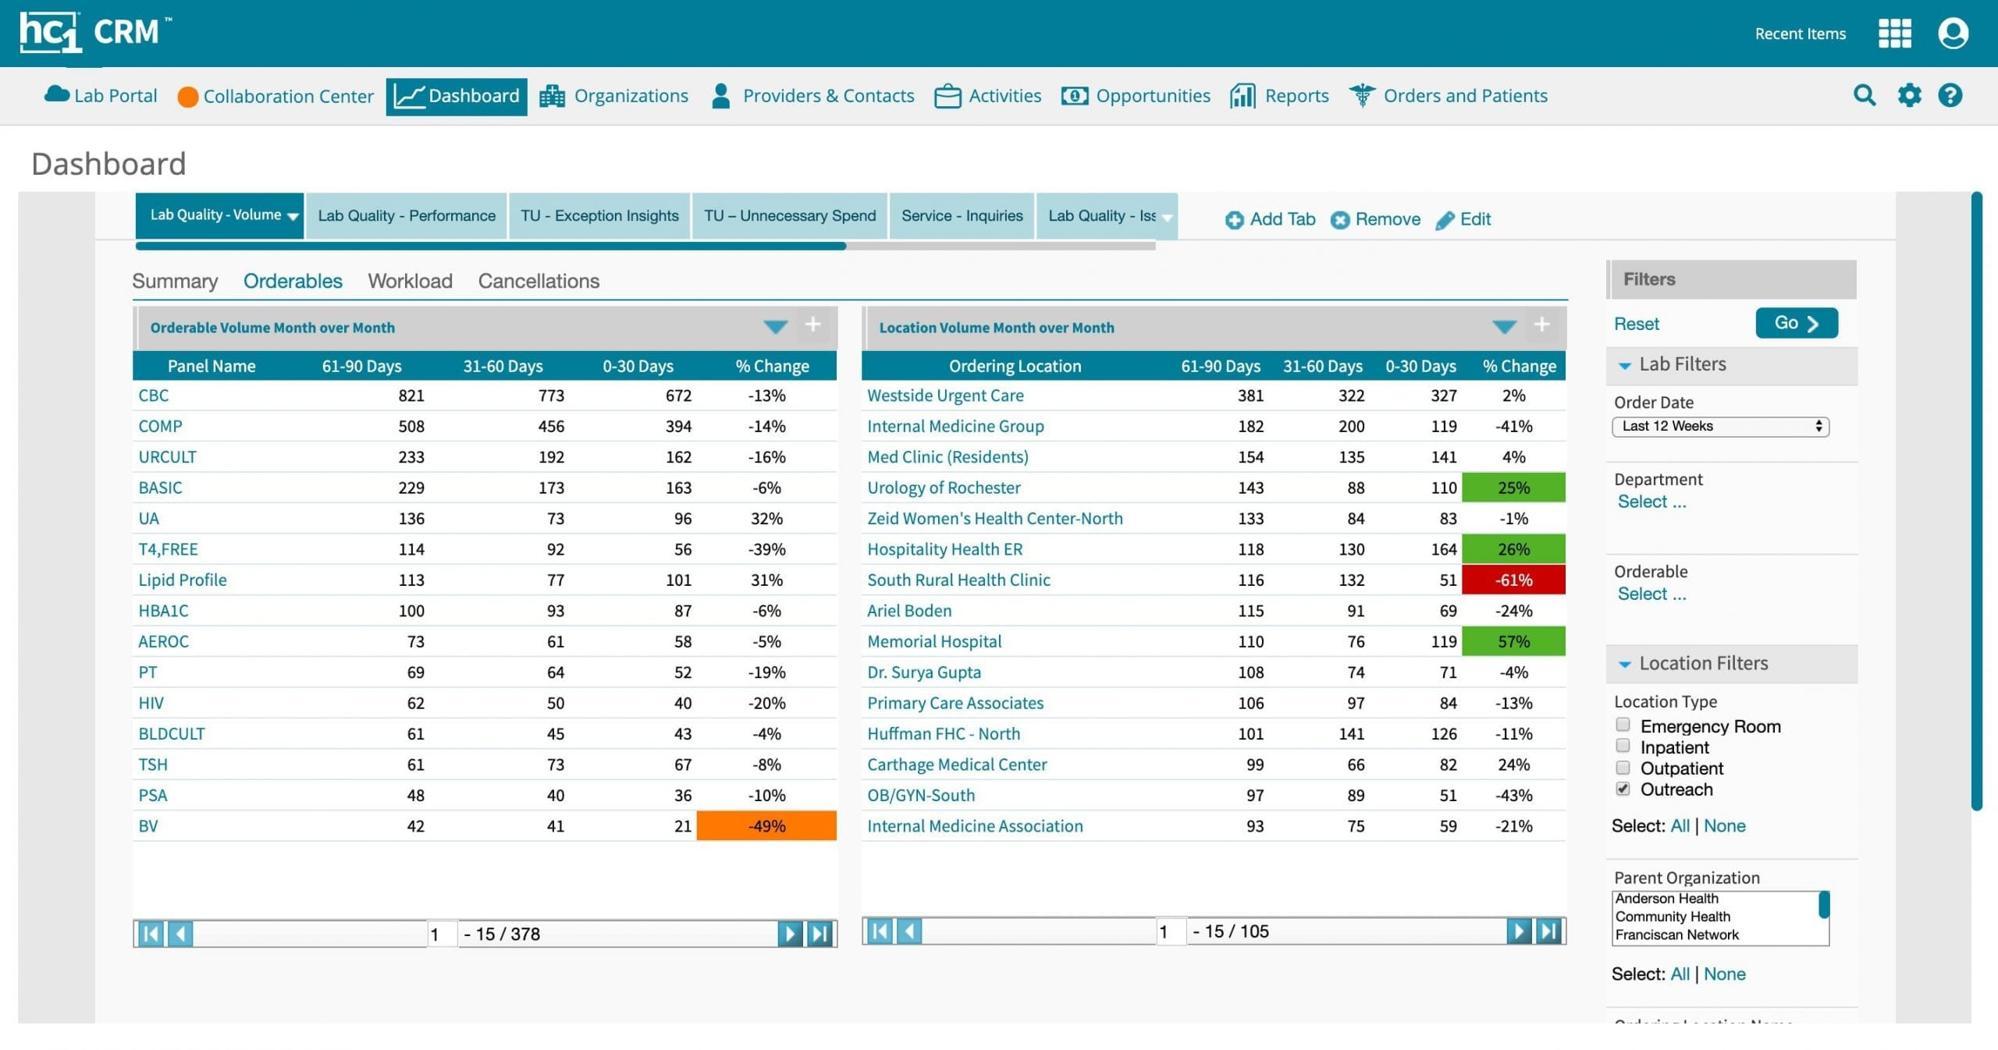 HC1 Healthcare CRM interface